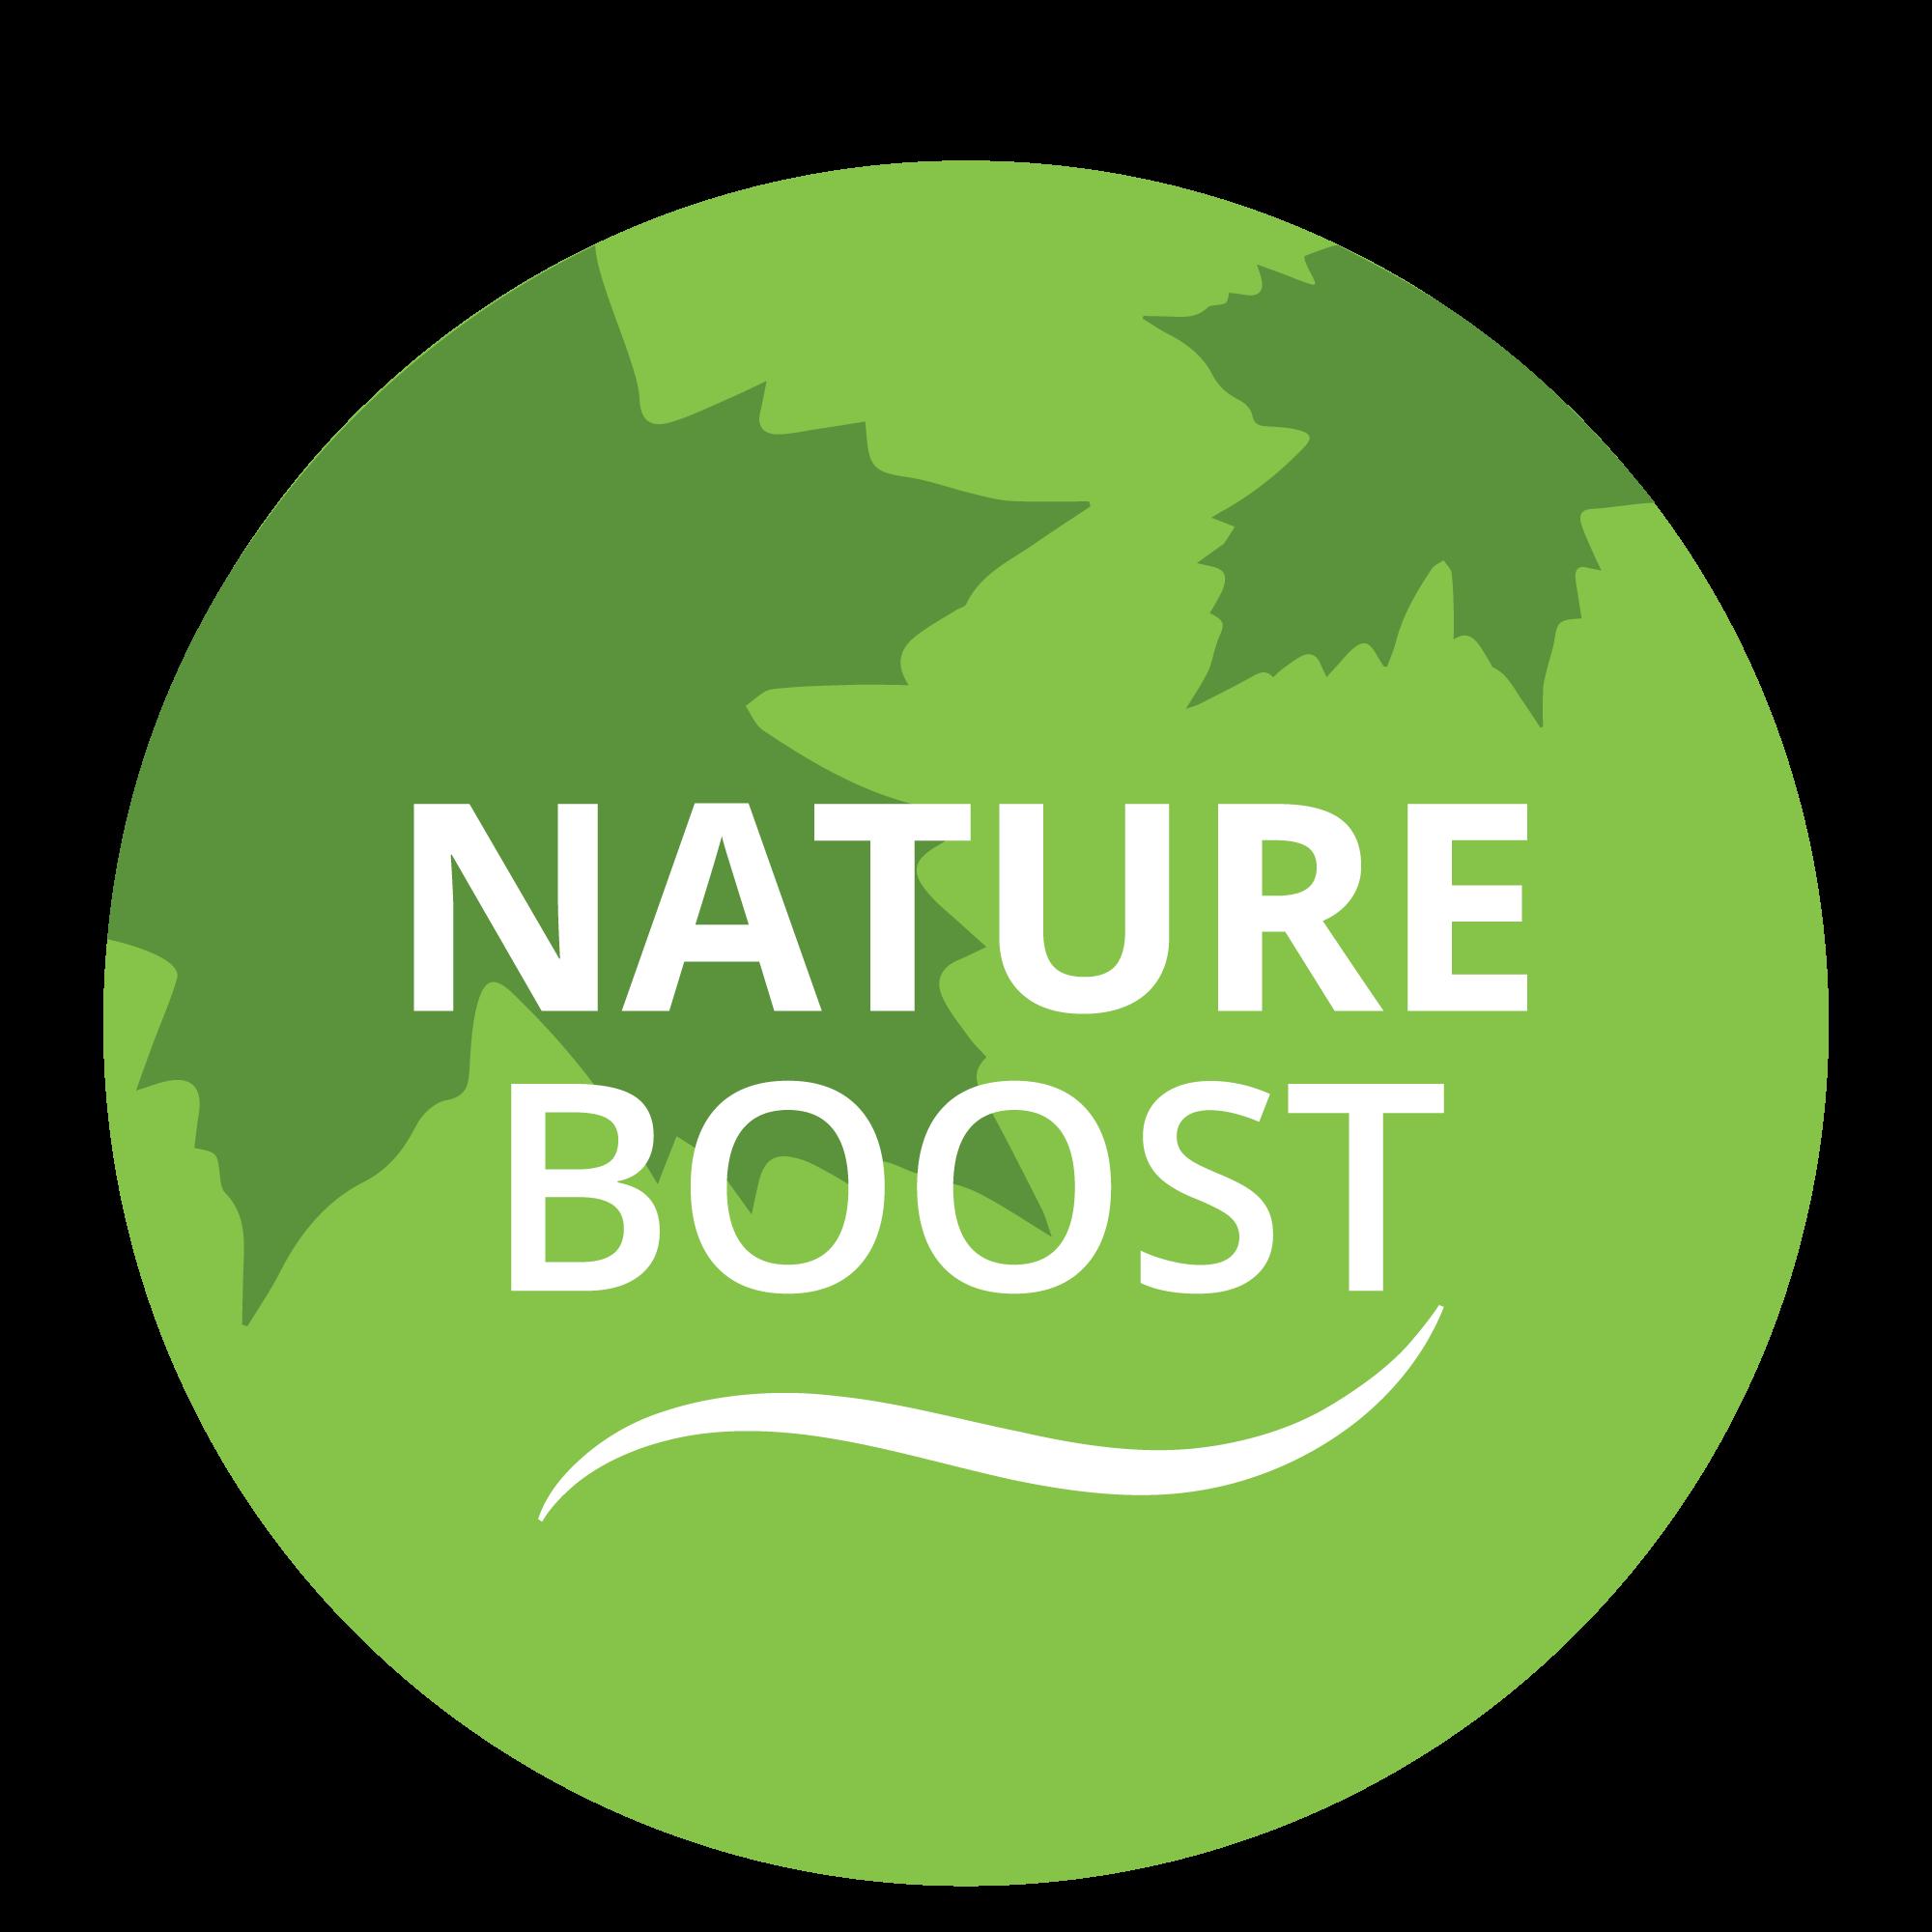 Nature Boost